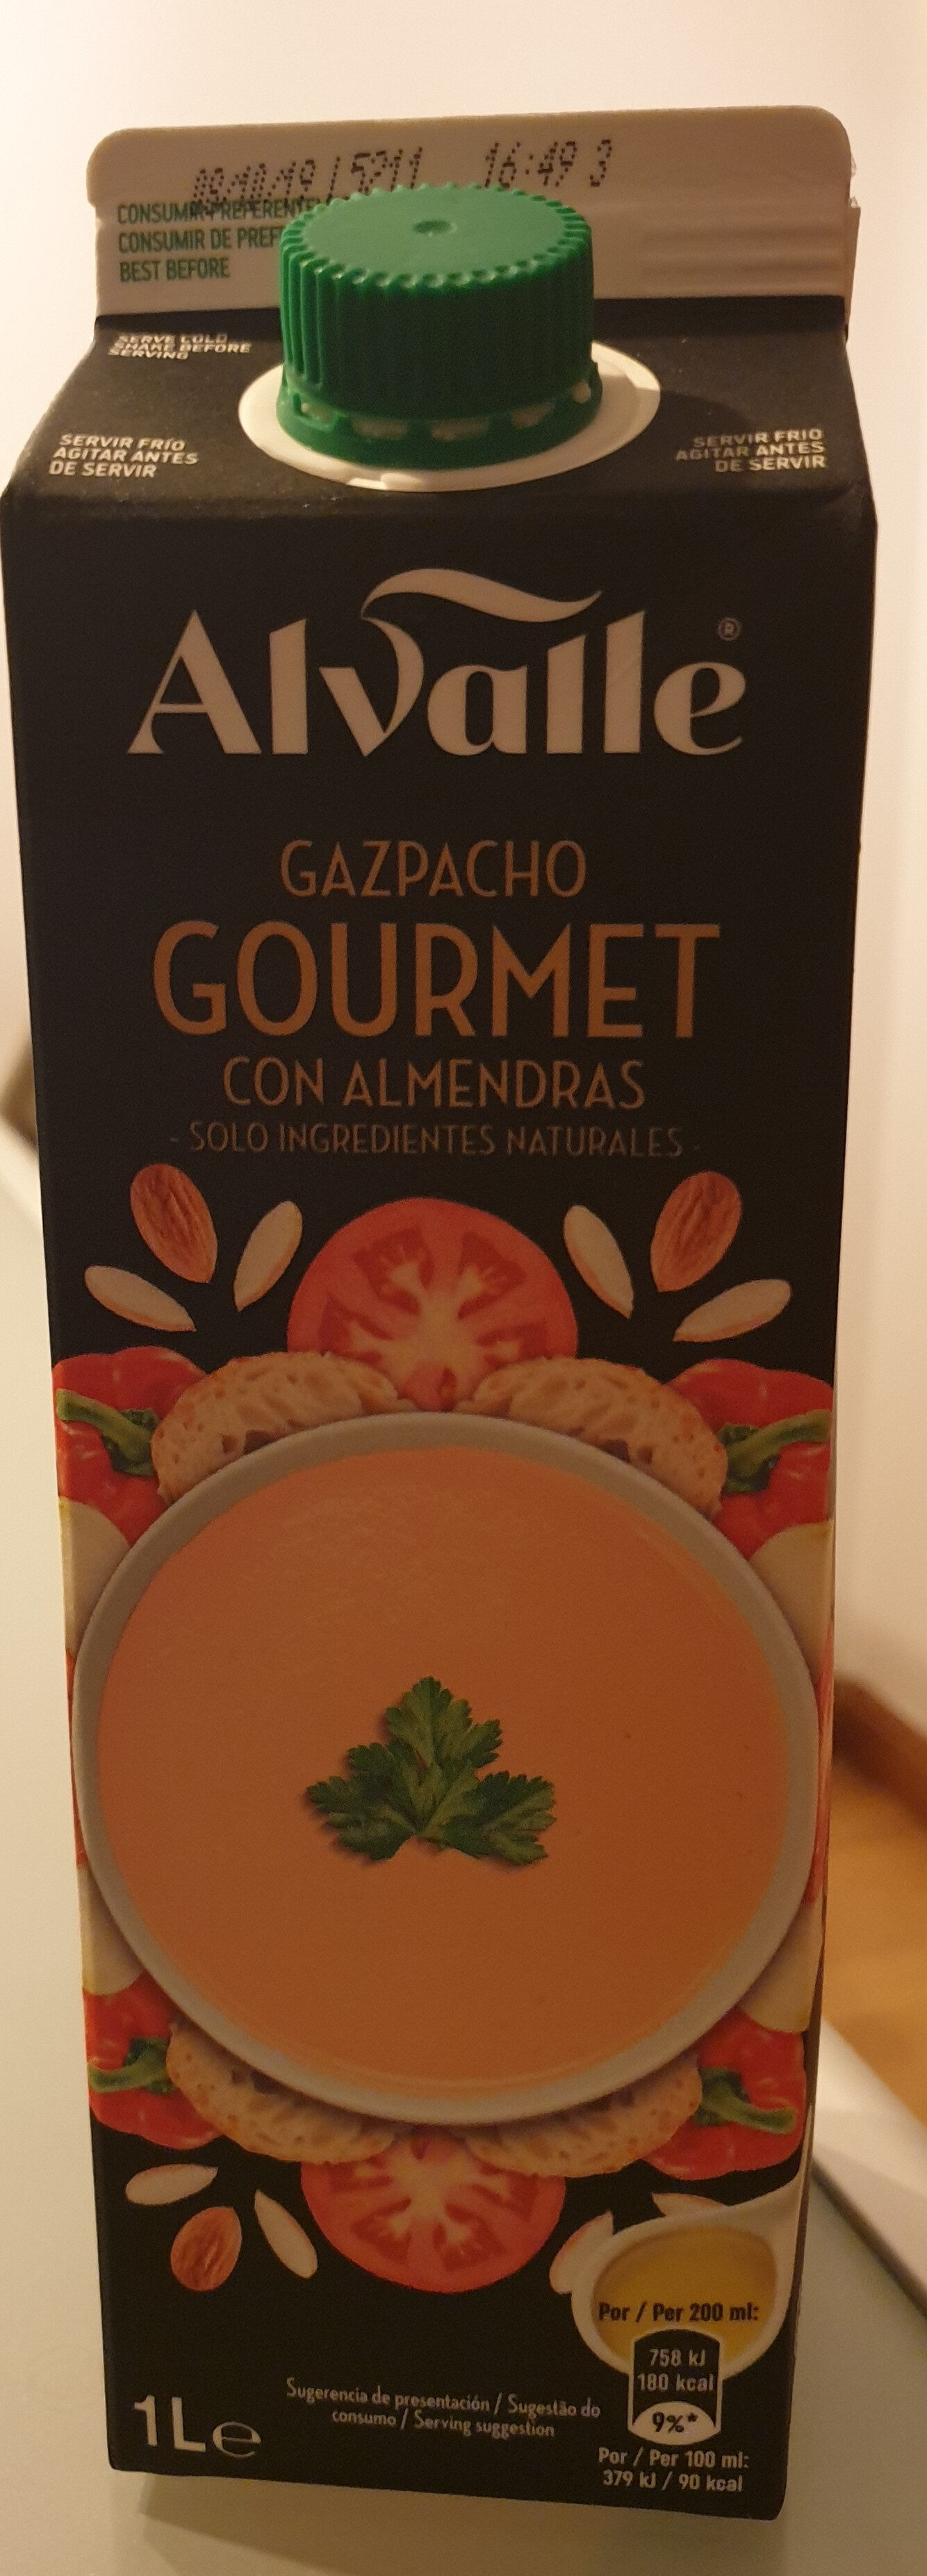 Gazpacho gourmet con almendras envase 1 l - Producto